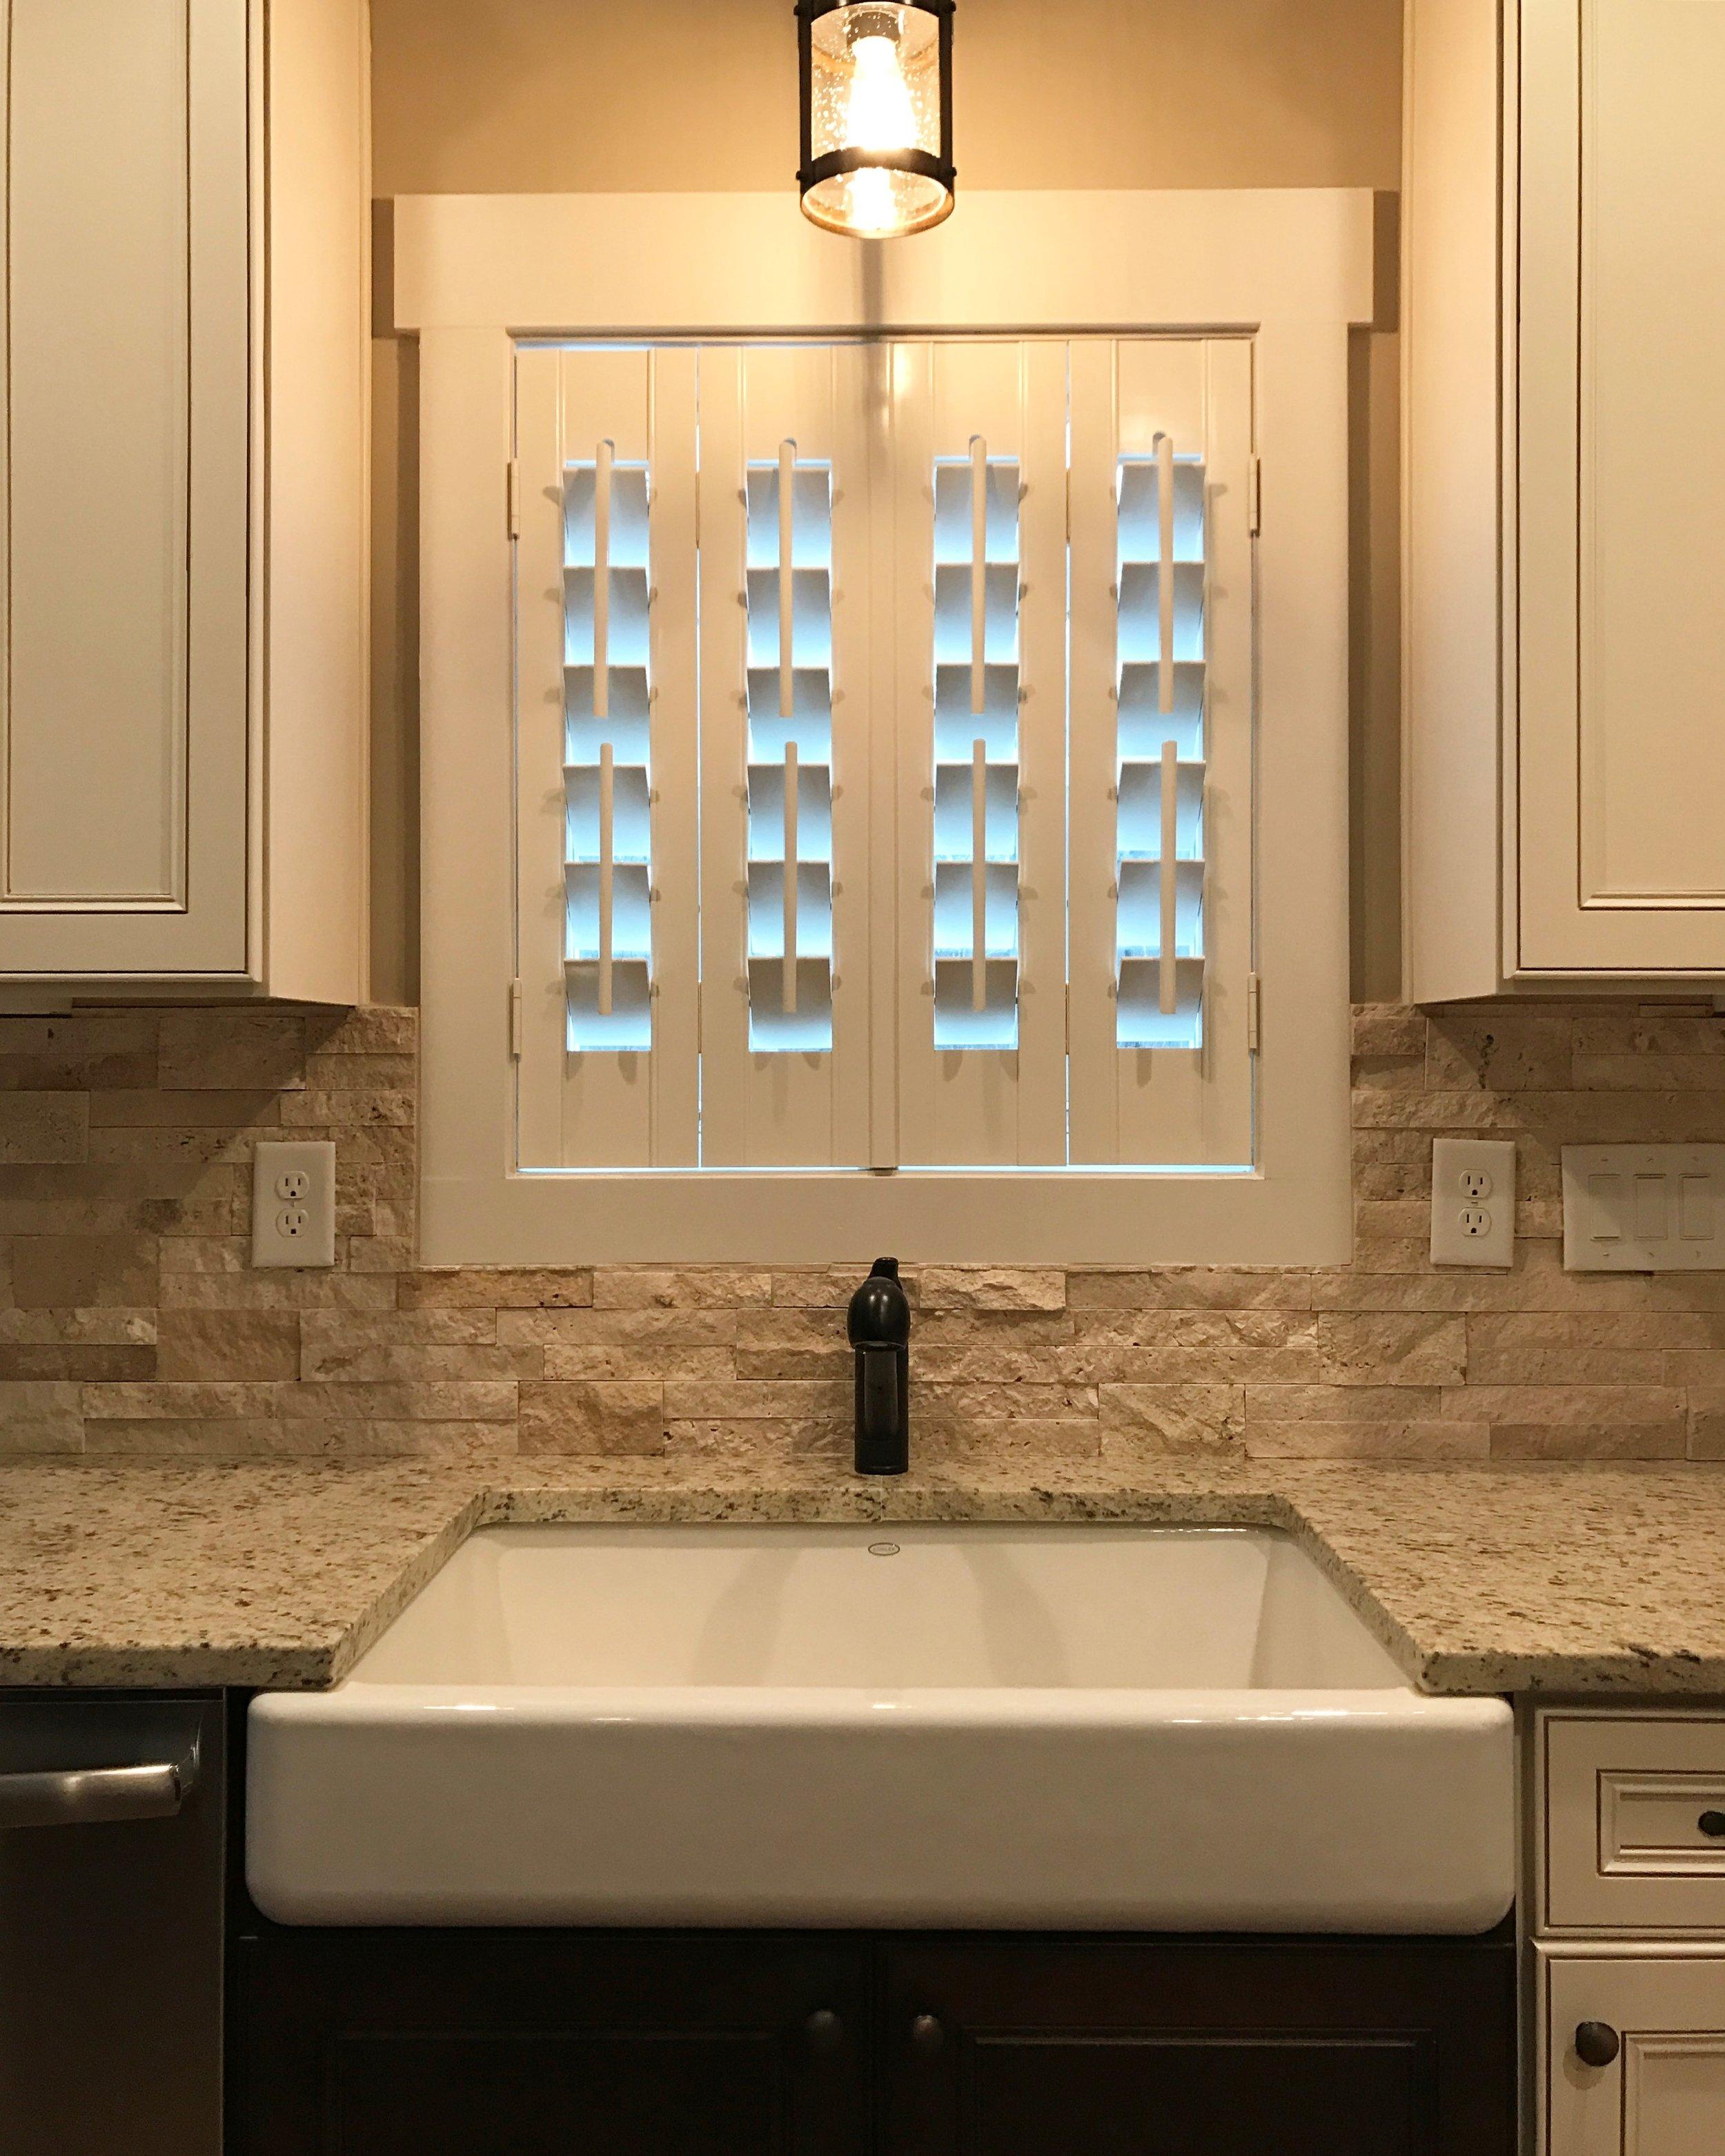 Four Panels Per Window